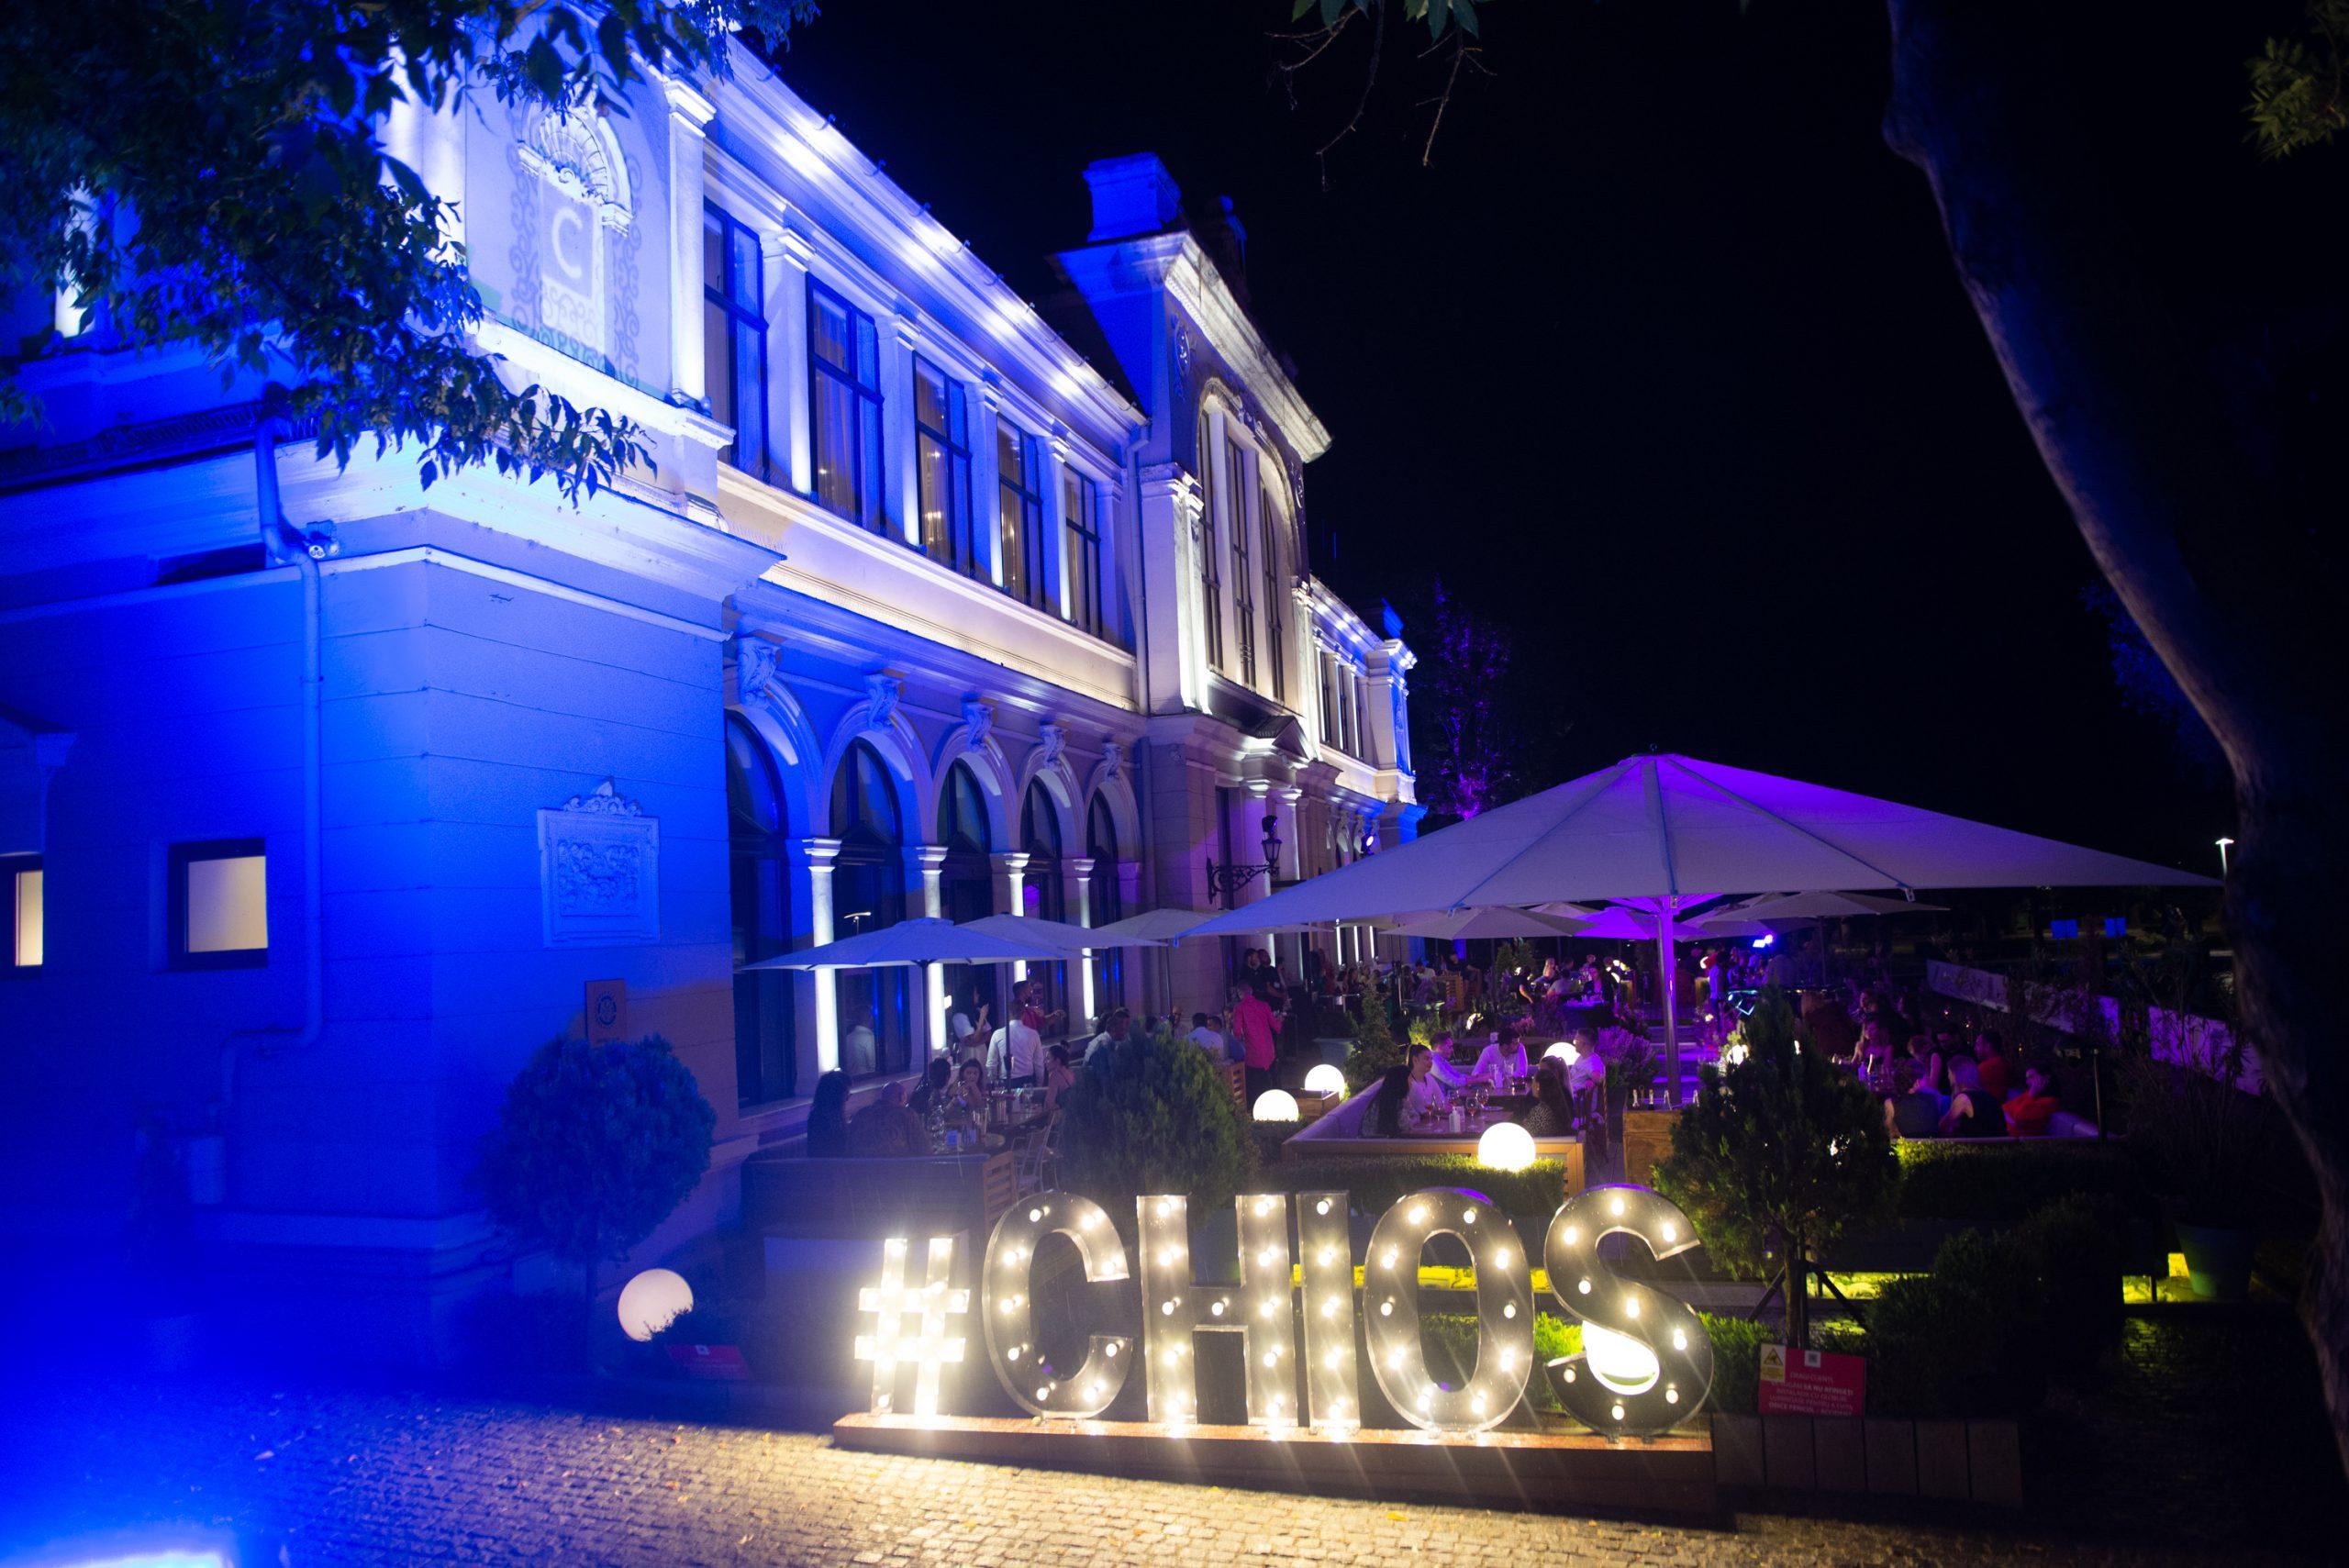 CHIOS SOCIAL BEATS, 25 Iunie '21 @ CHIOS Social Lounge